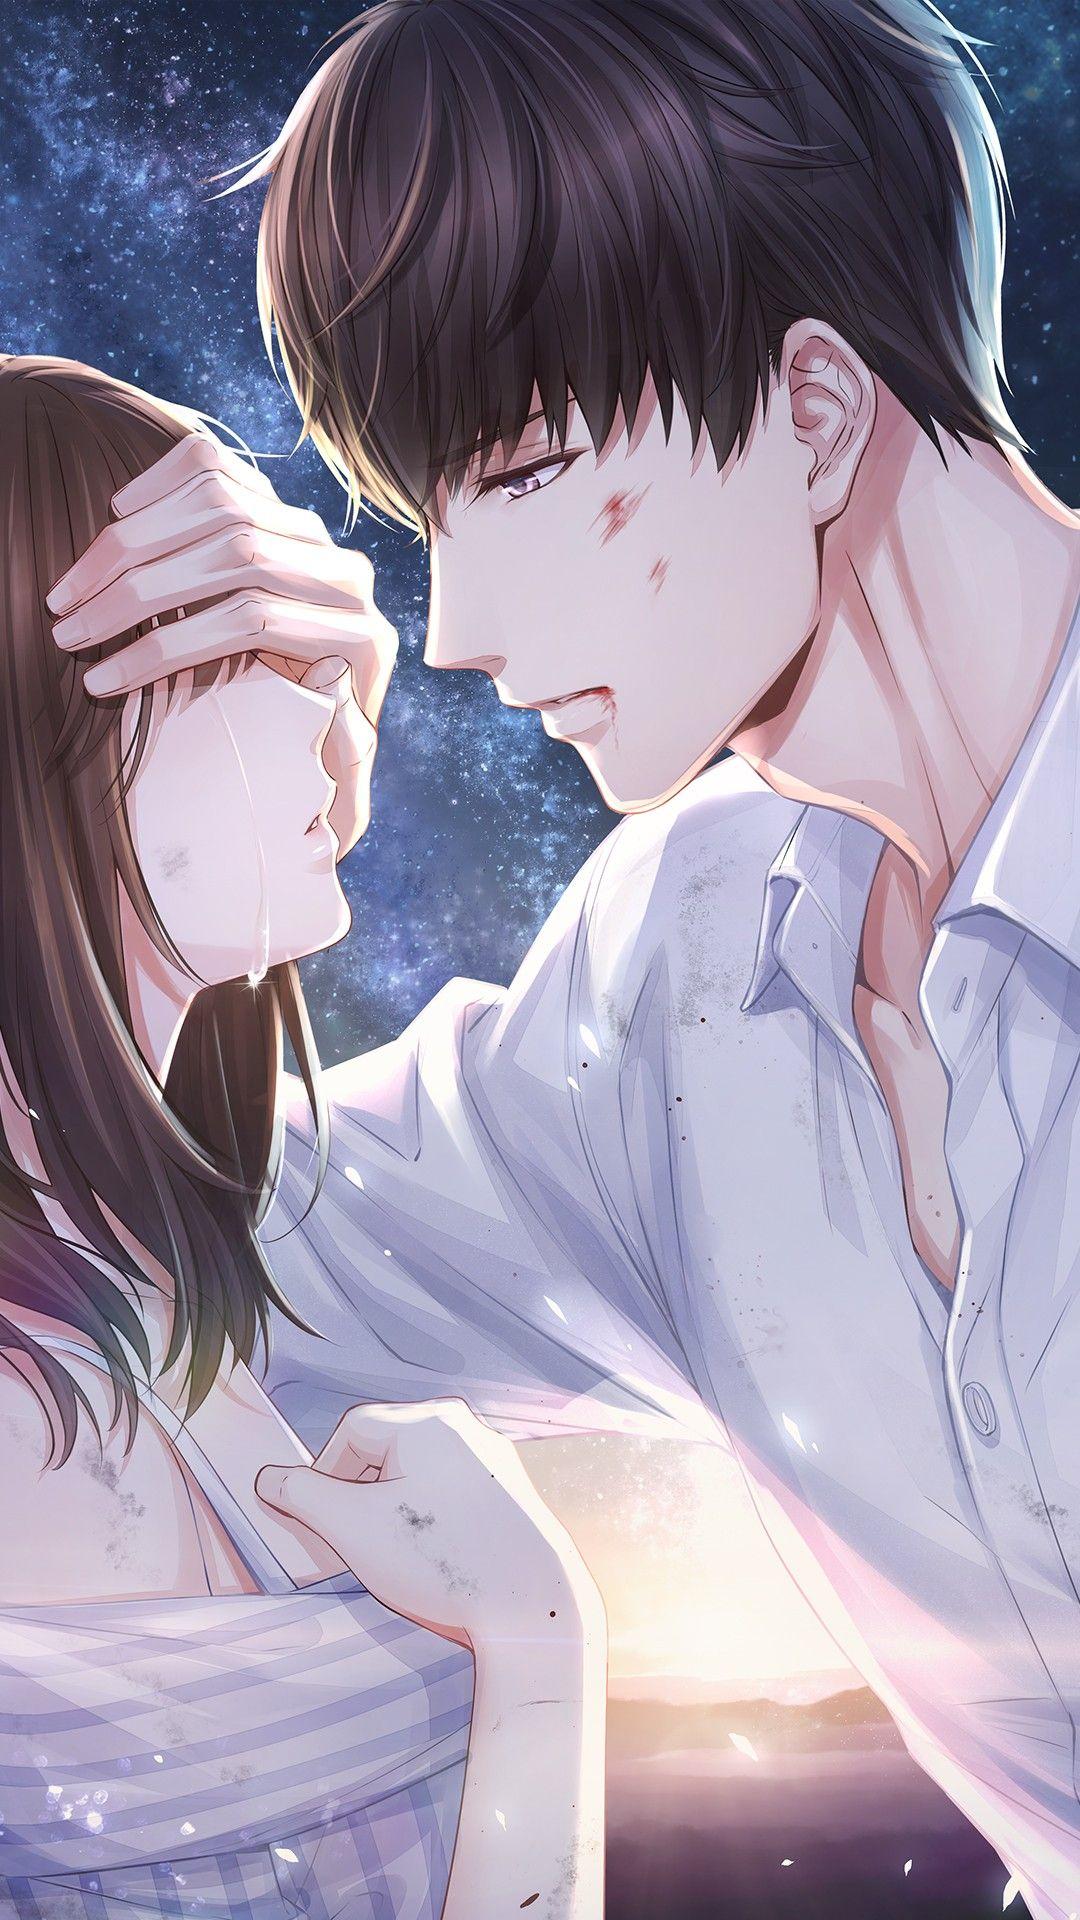 Anime love couple manga couple couple art romantic anime couples cute anime